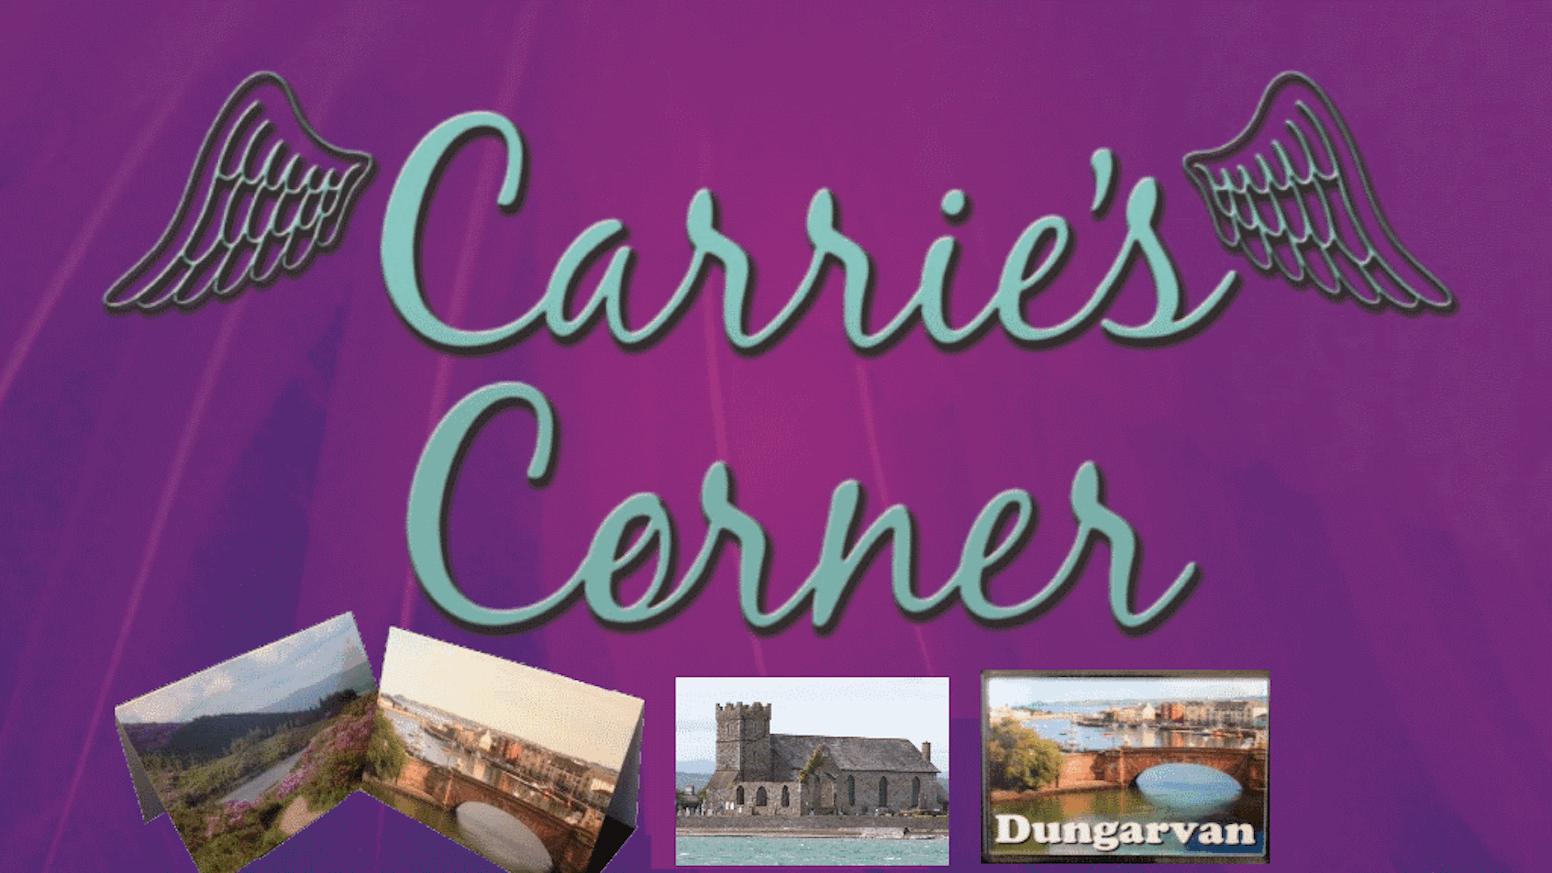 Carries Corner Greeting Cards By Carmel Keith Kickstarter